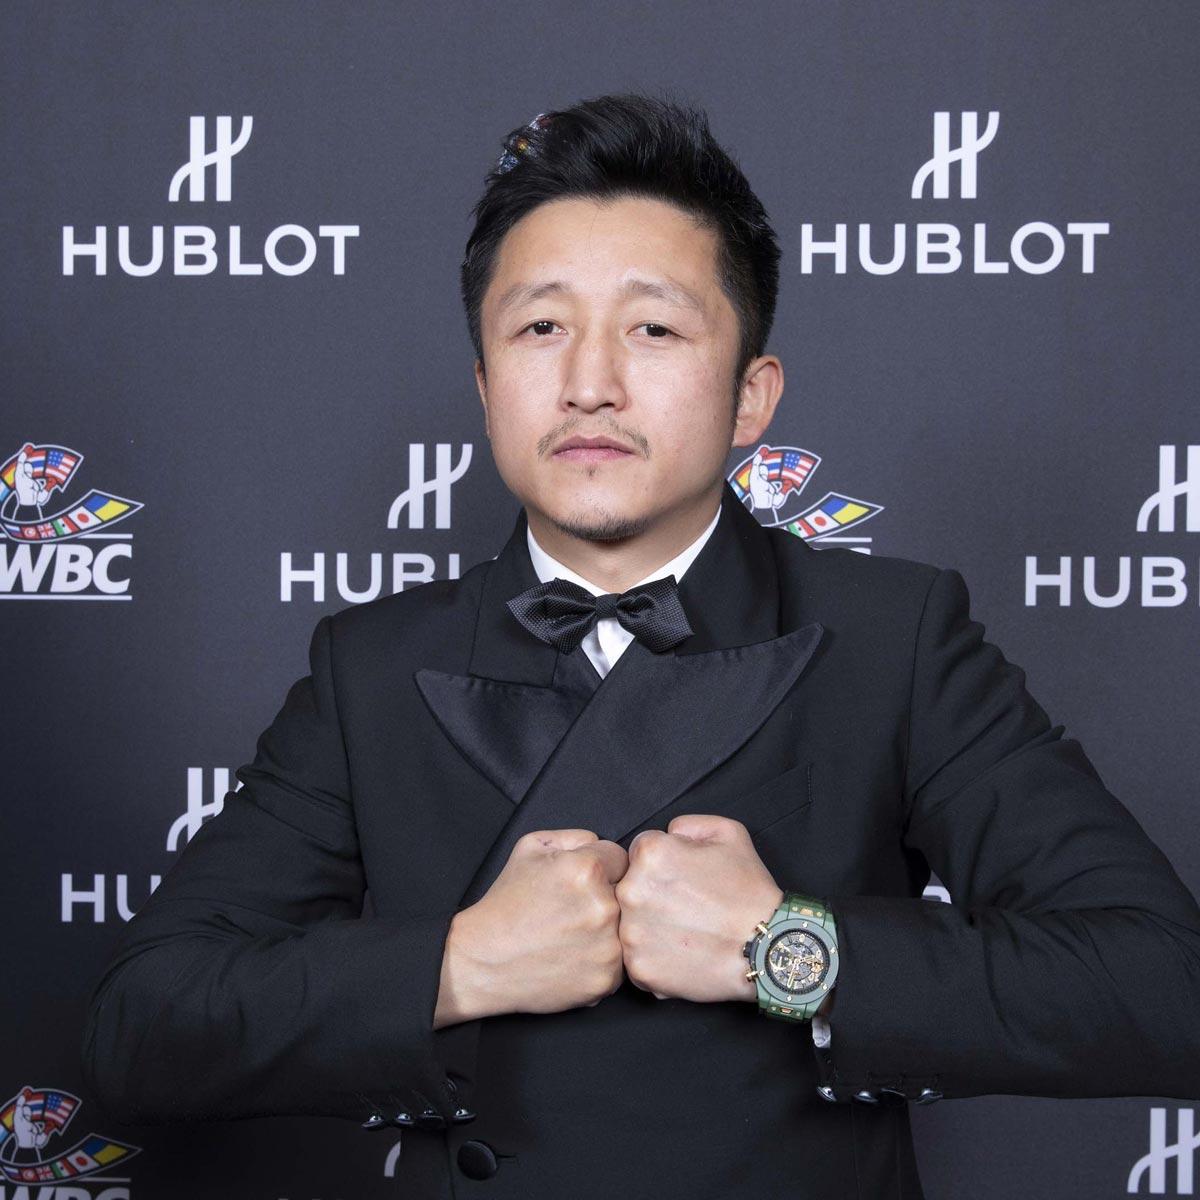 La Cote des Montres : Photo - Hublot Big Bang Unico WBC